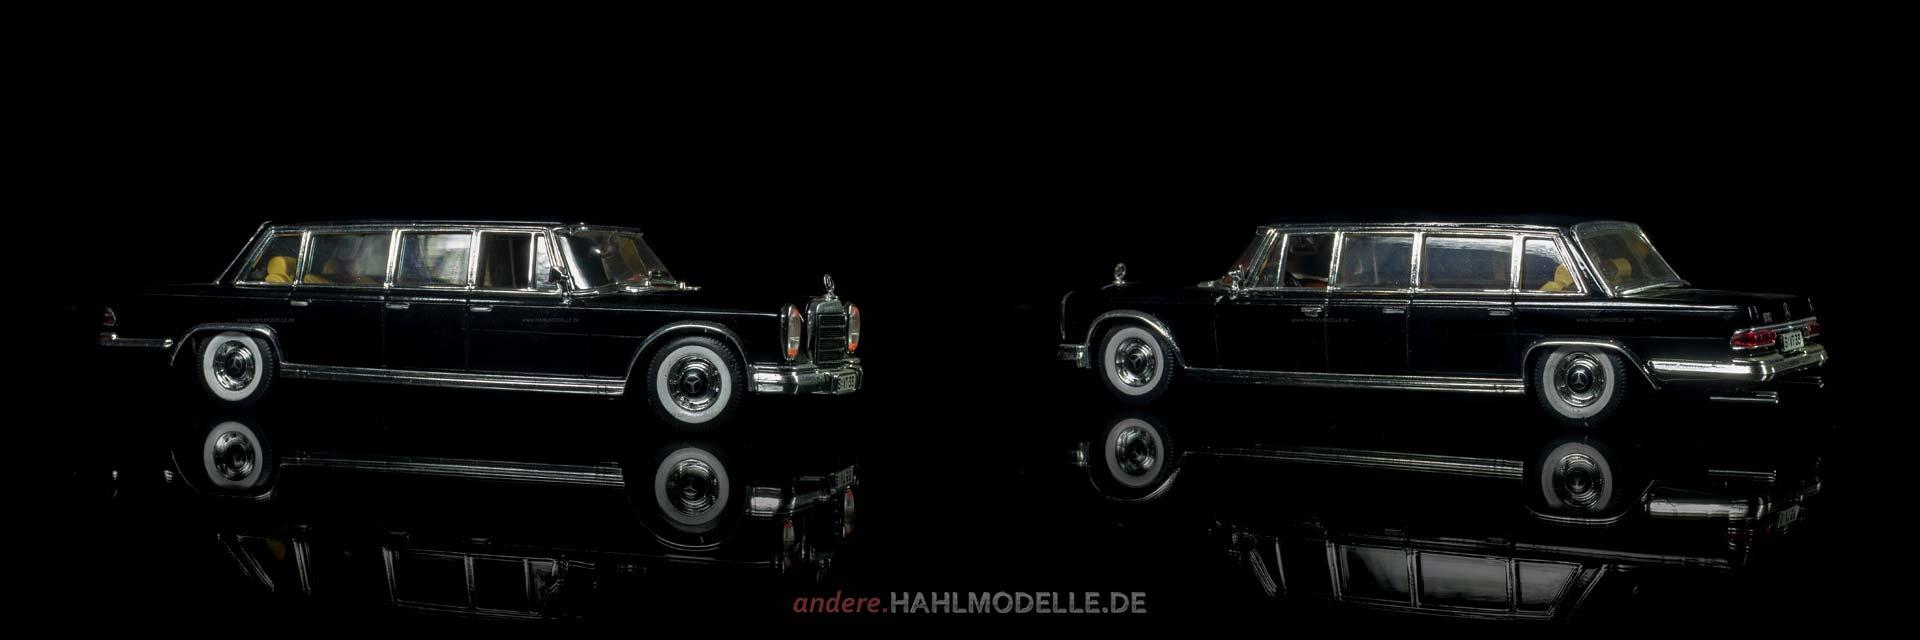 Mercedes-Benz 600 (W 100) | Limousine | Vitesse | www.andere.hahlmodelle.de